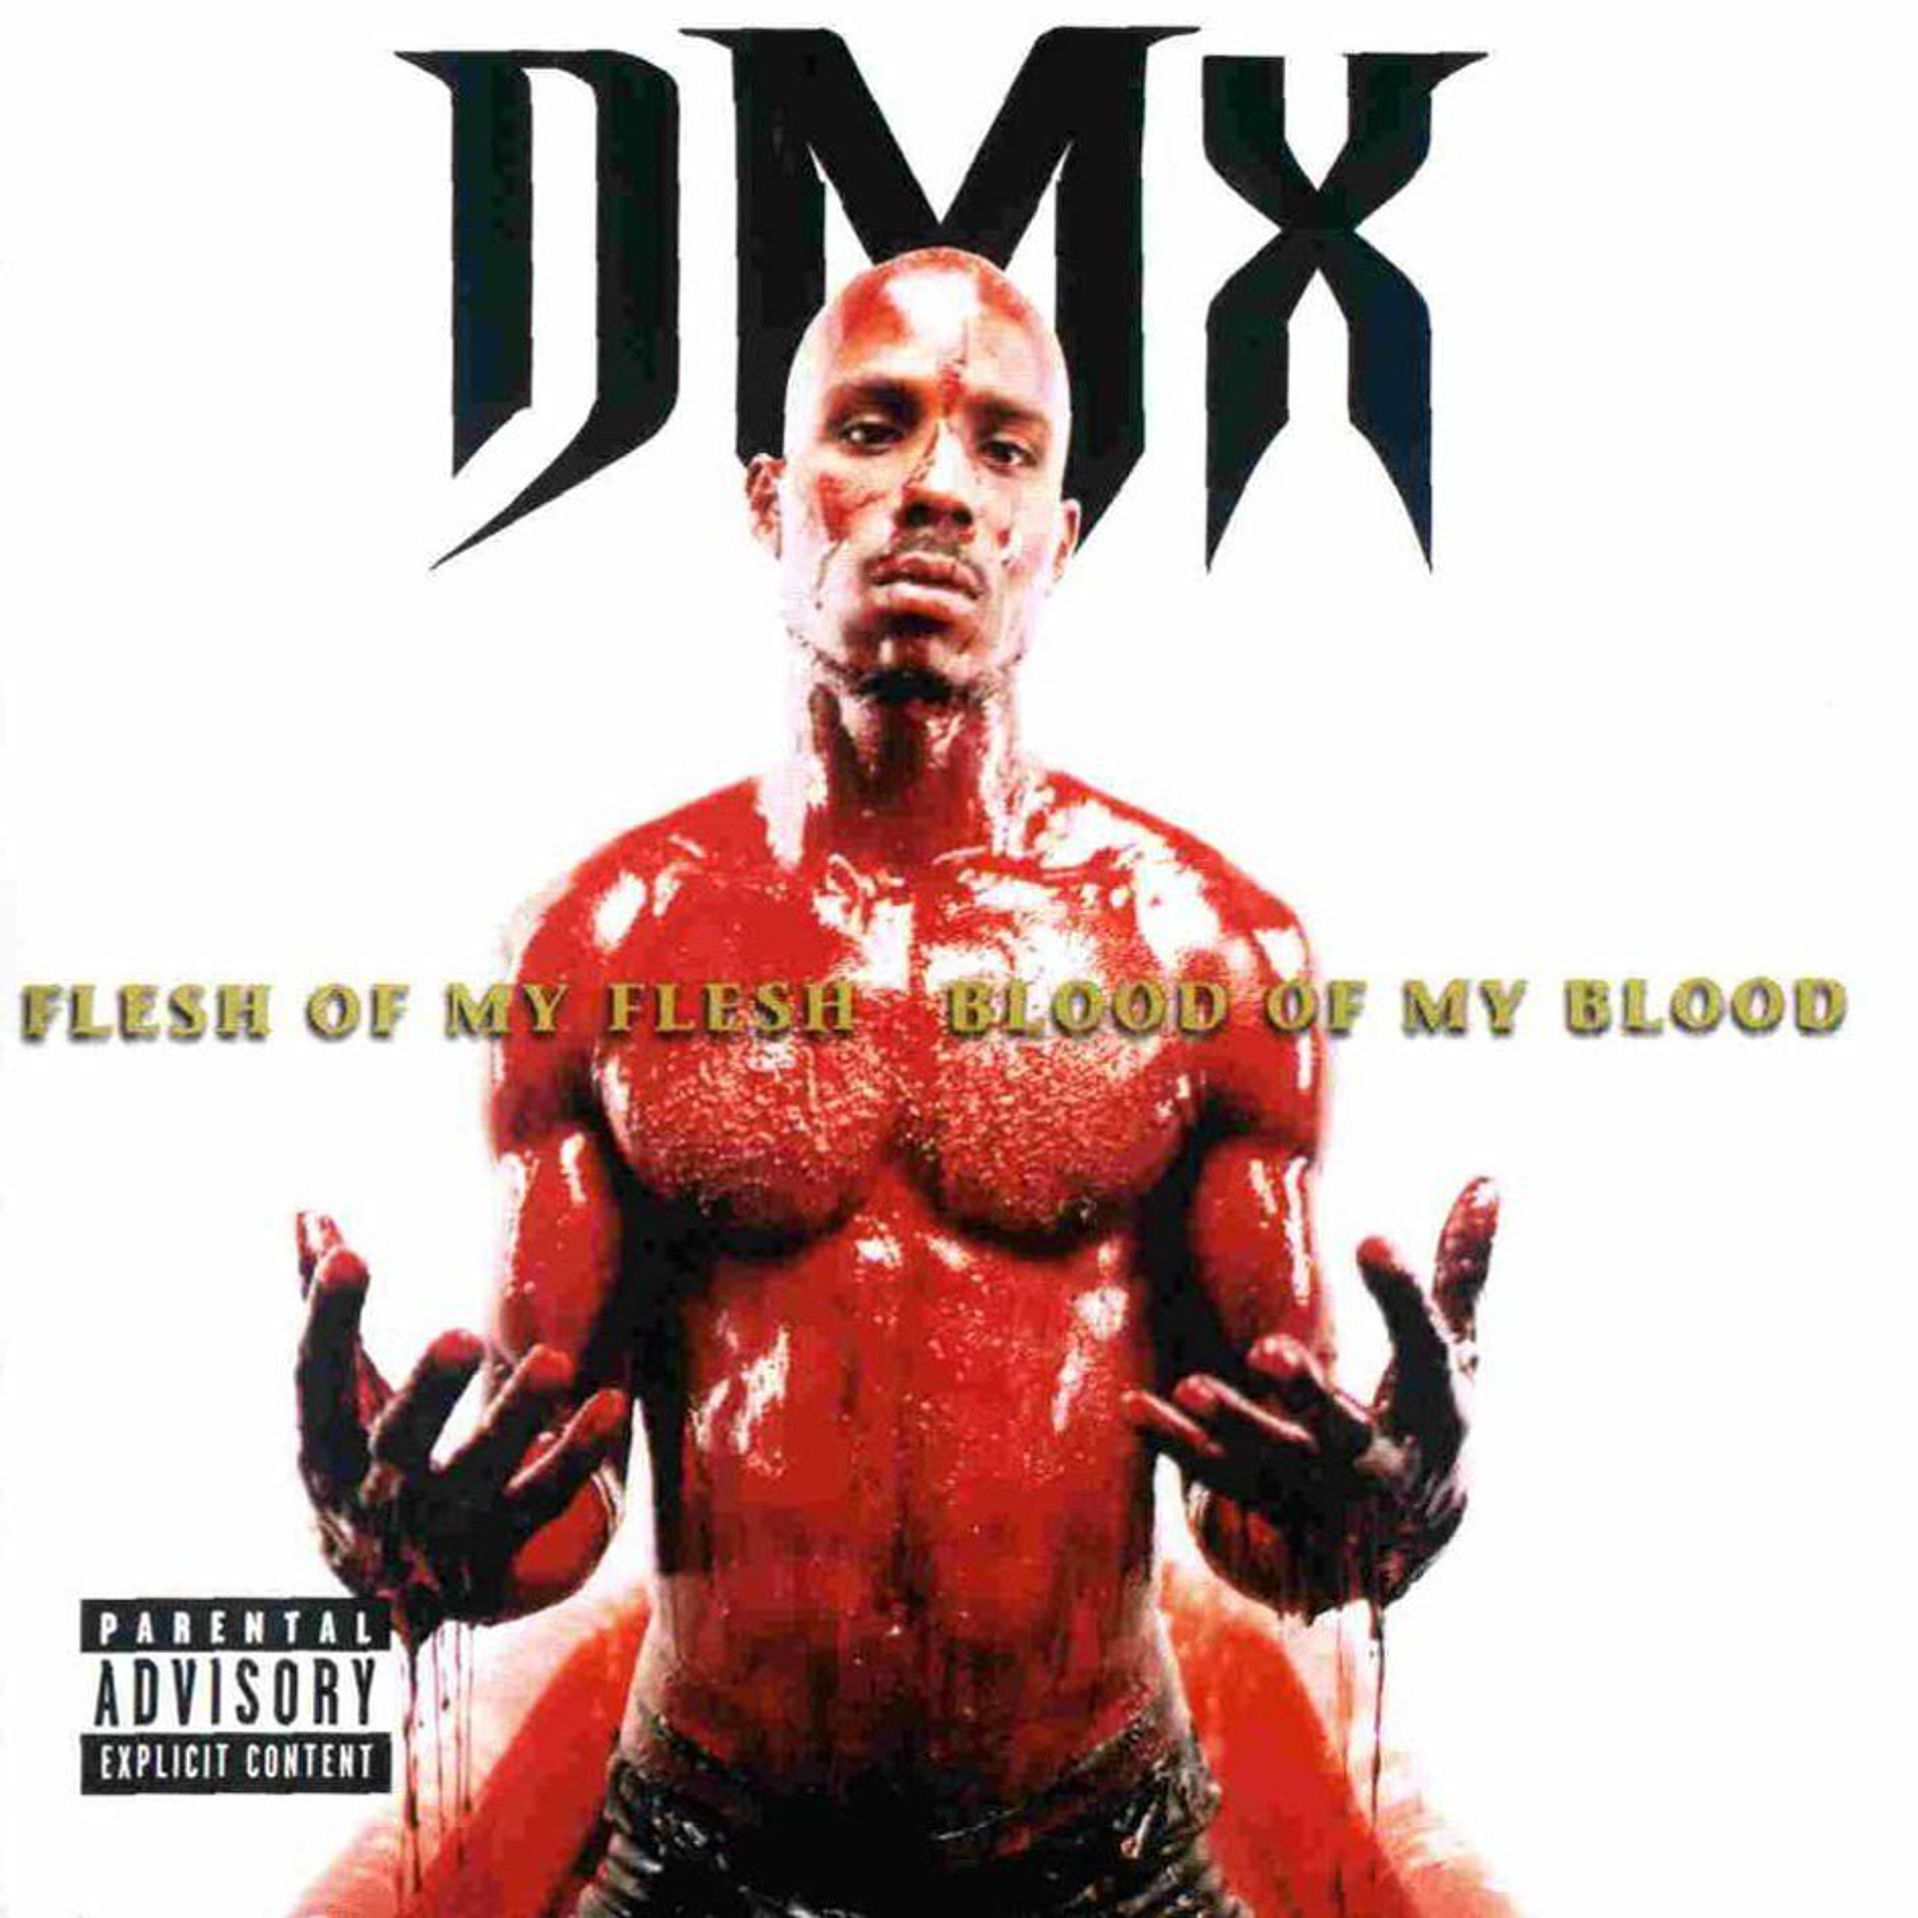 Album Title: Flesh of My Flesh, Blood of My Blood by: DMX